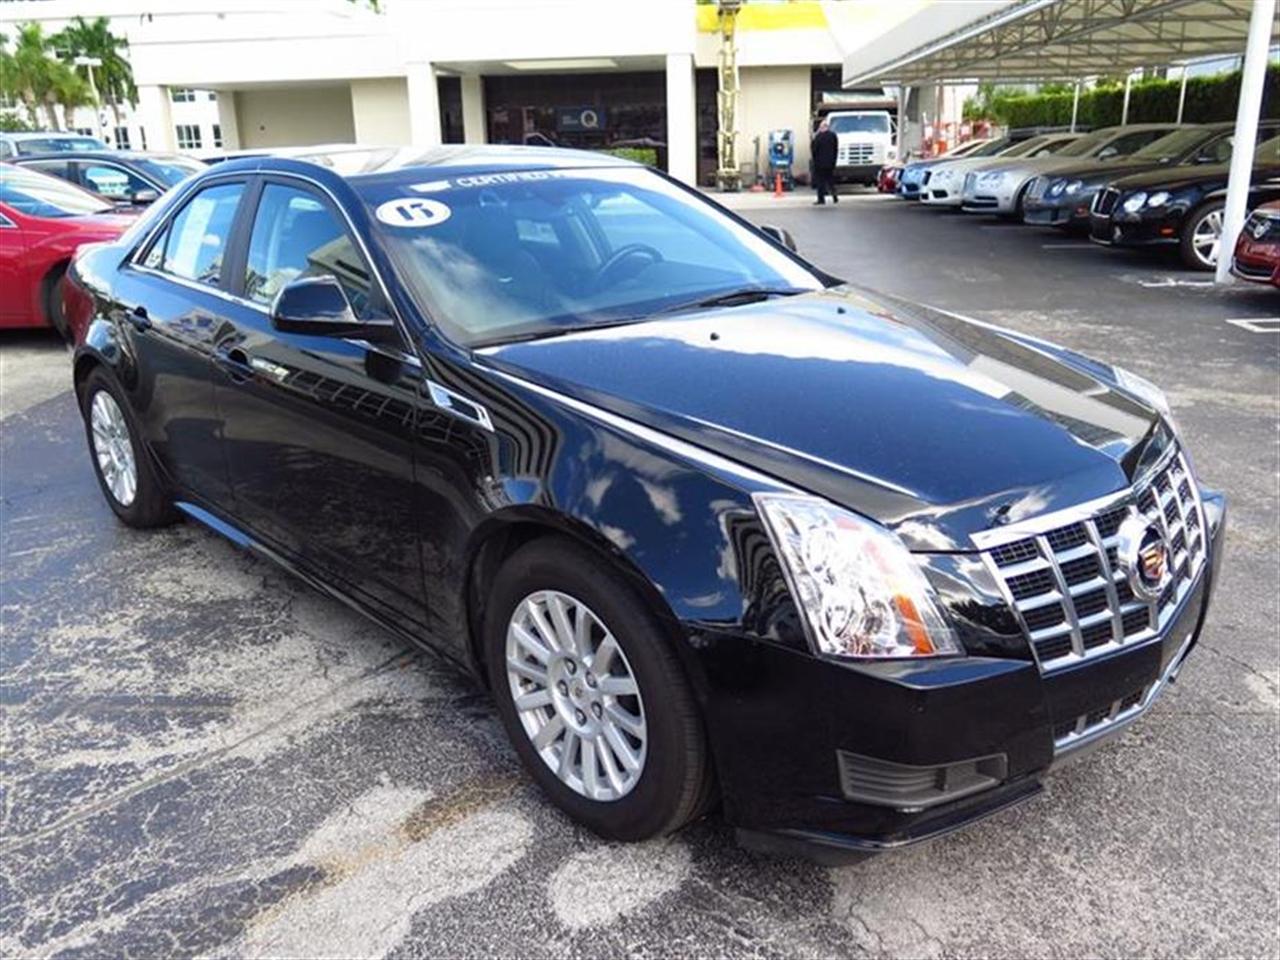 2013 CADILLAC CTS 4dr Sdn 30L Luxury RWD 11175 miles VIN 1G6DE5E52D0127538